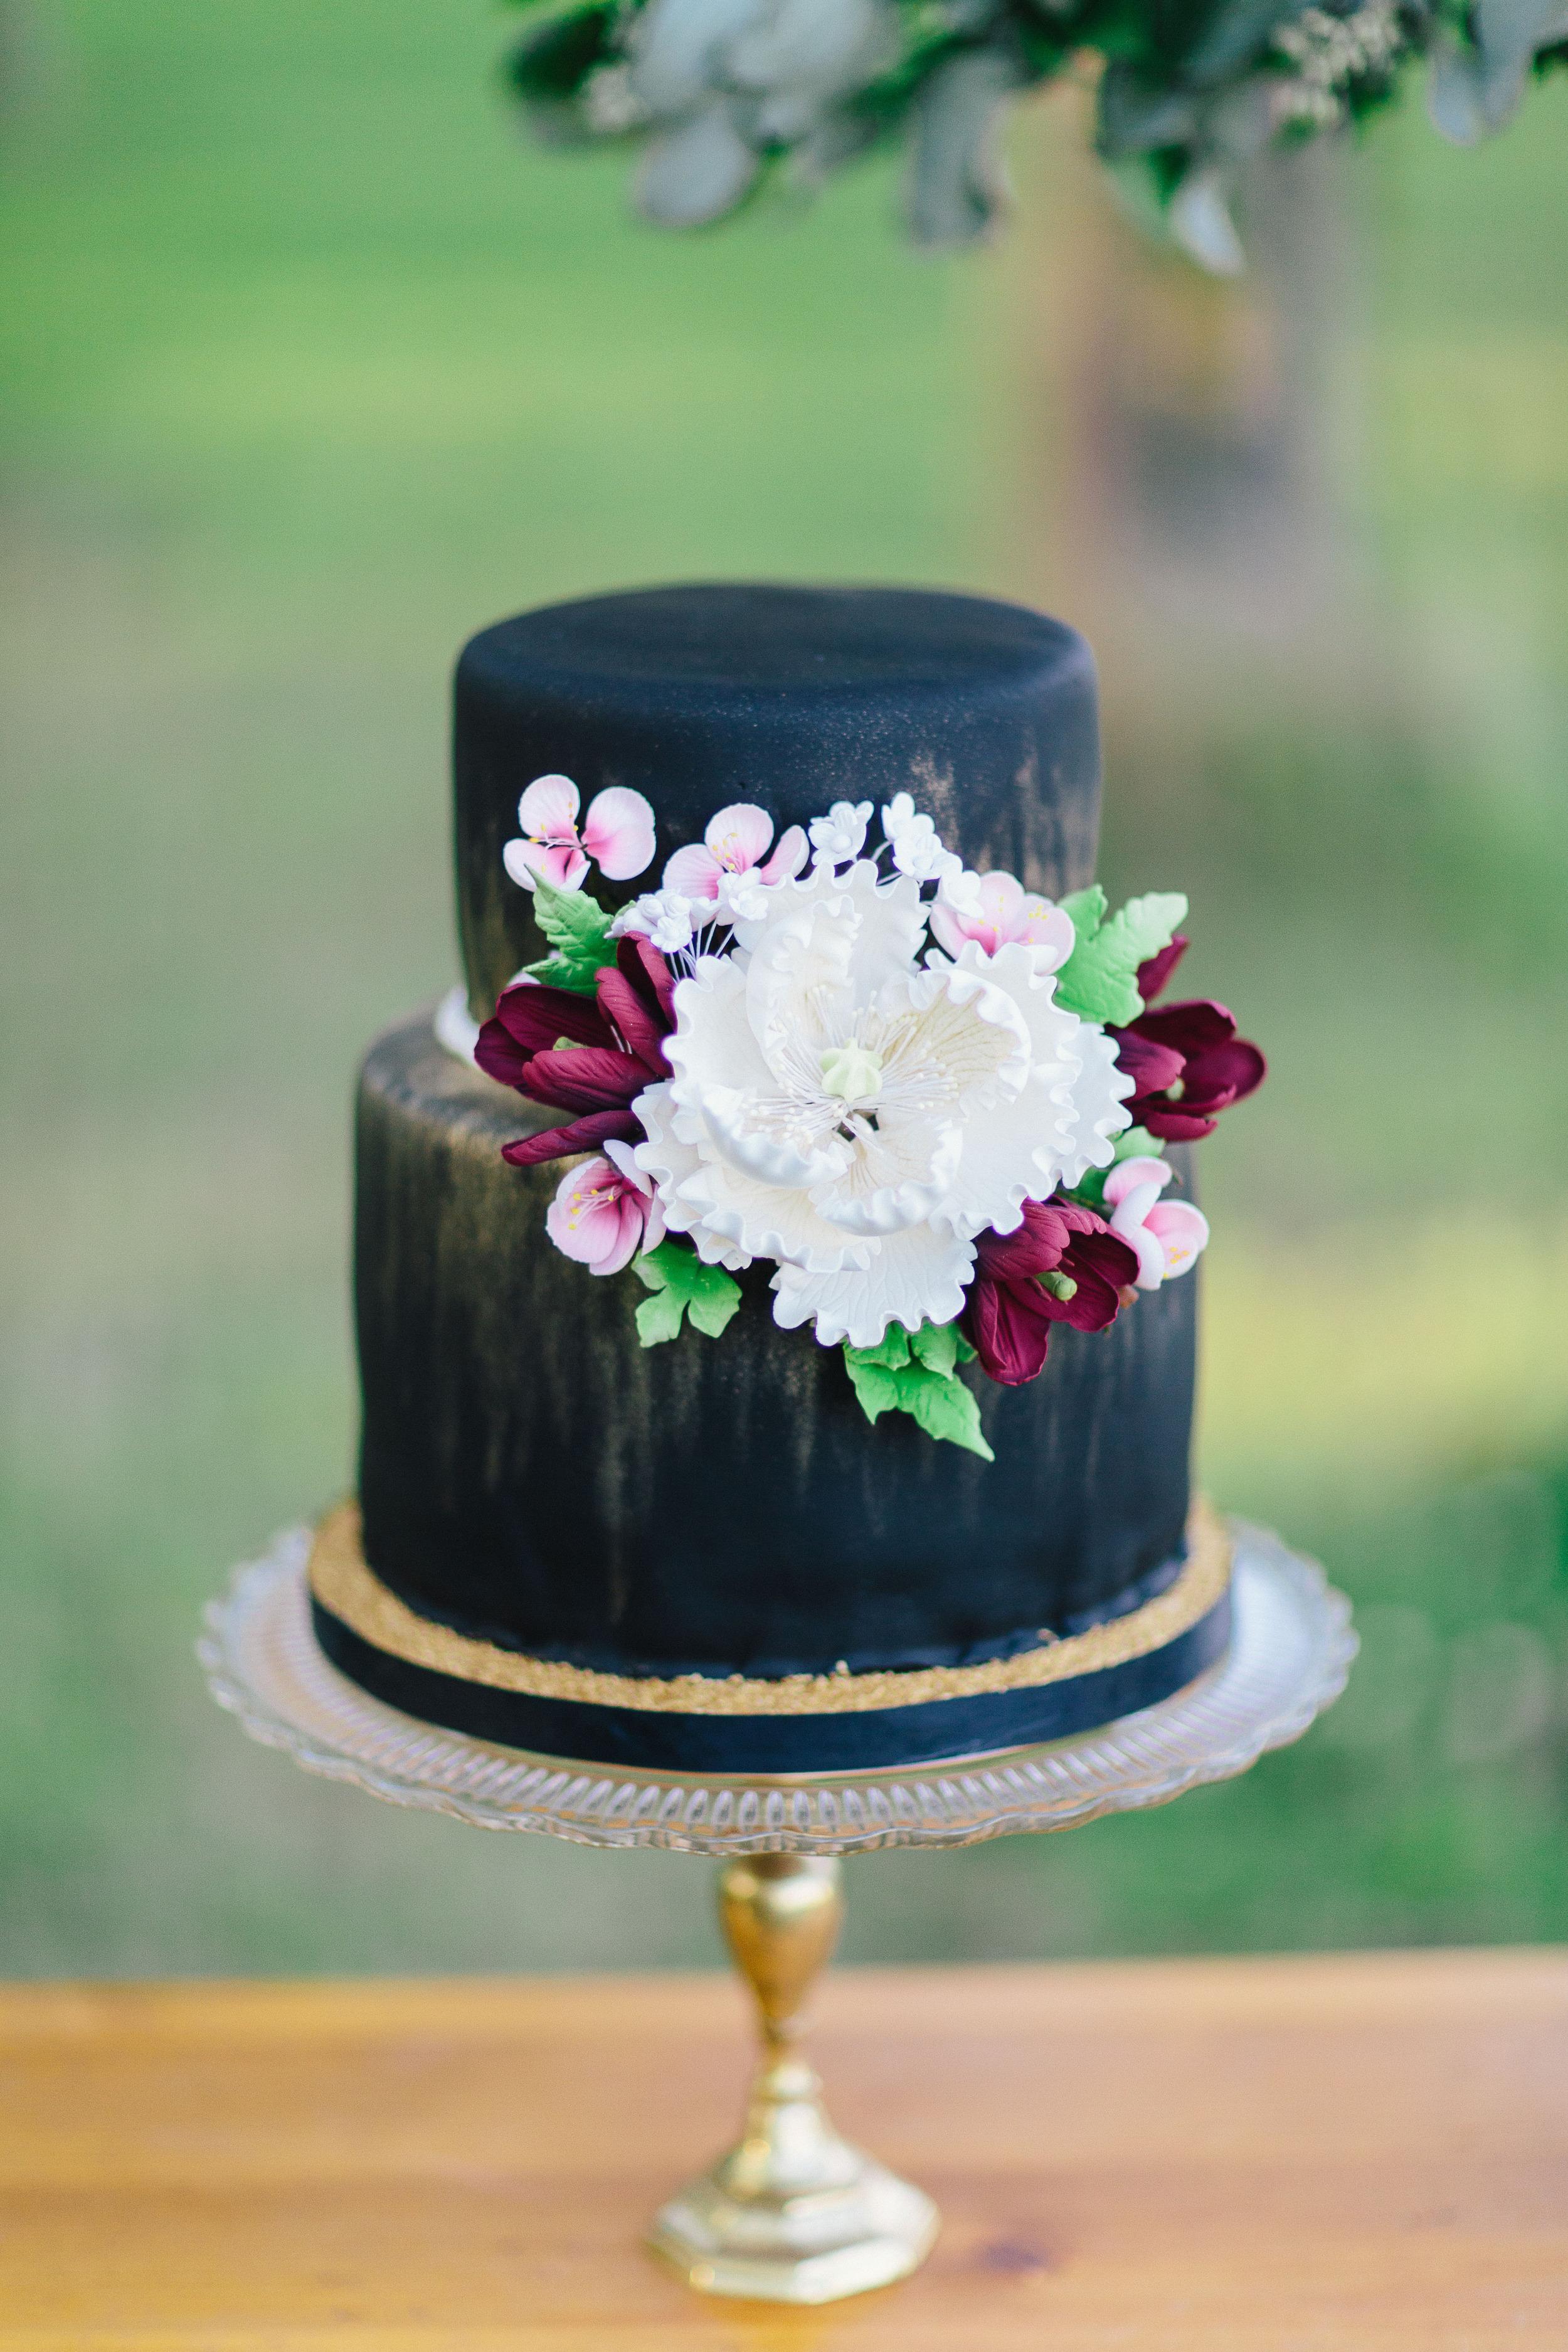 Maxit Flower Design; Vineyard Bridal Styled Shoot 0333_Kristen Curette Photography.jpg